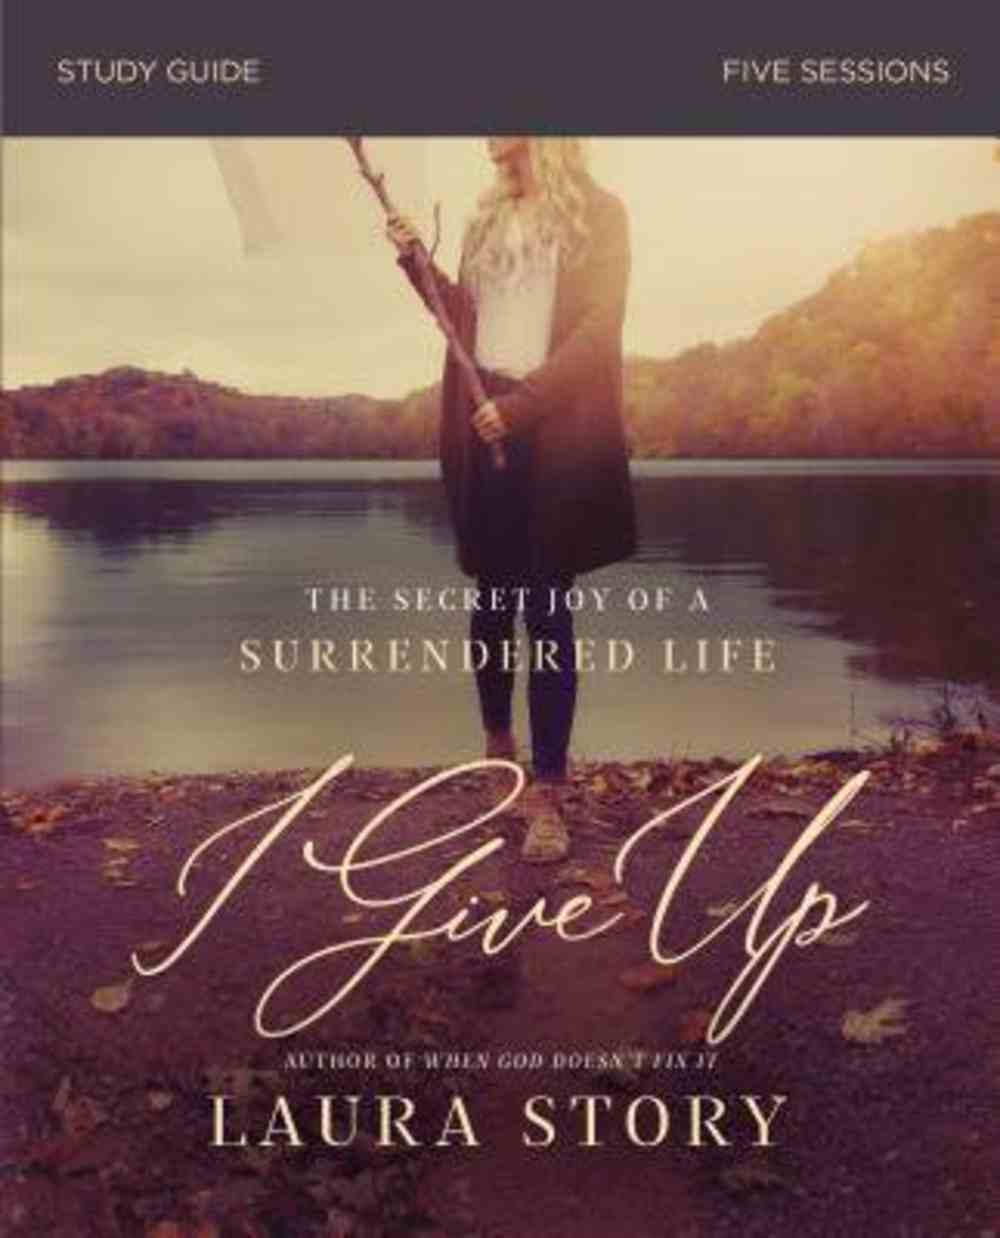 I Give Up: The Secret Joy of a Surrendered Life (Study Guide) Paperback